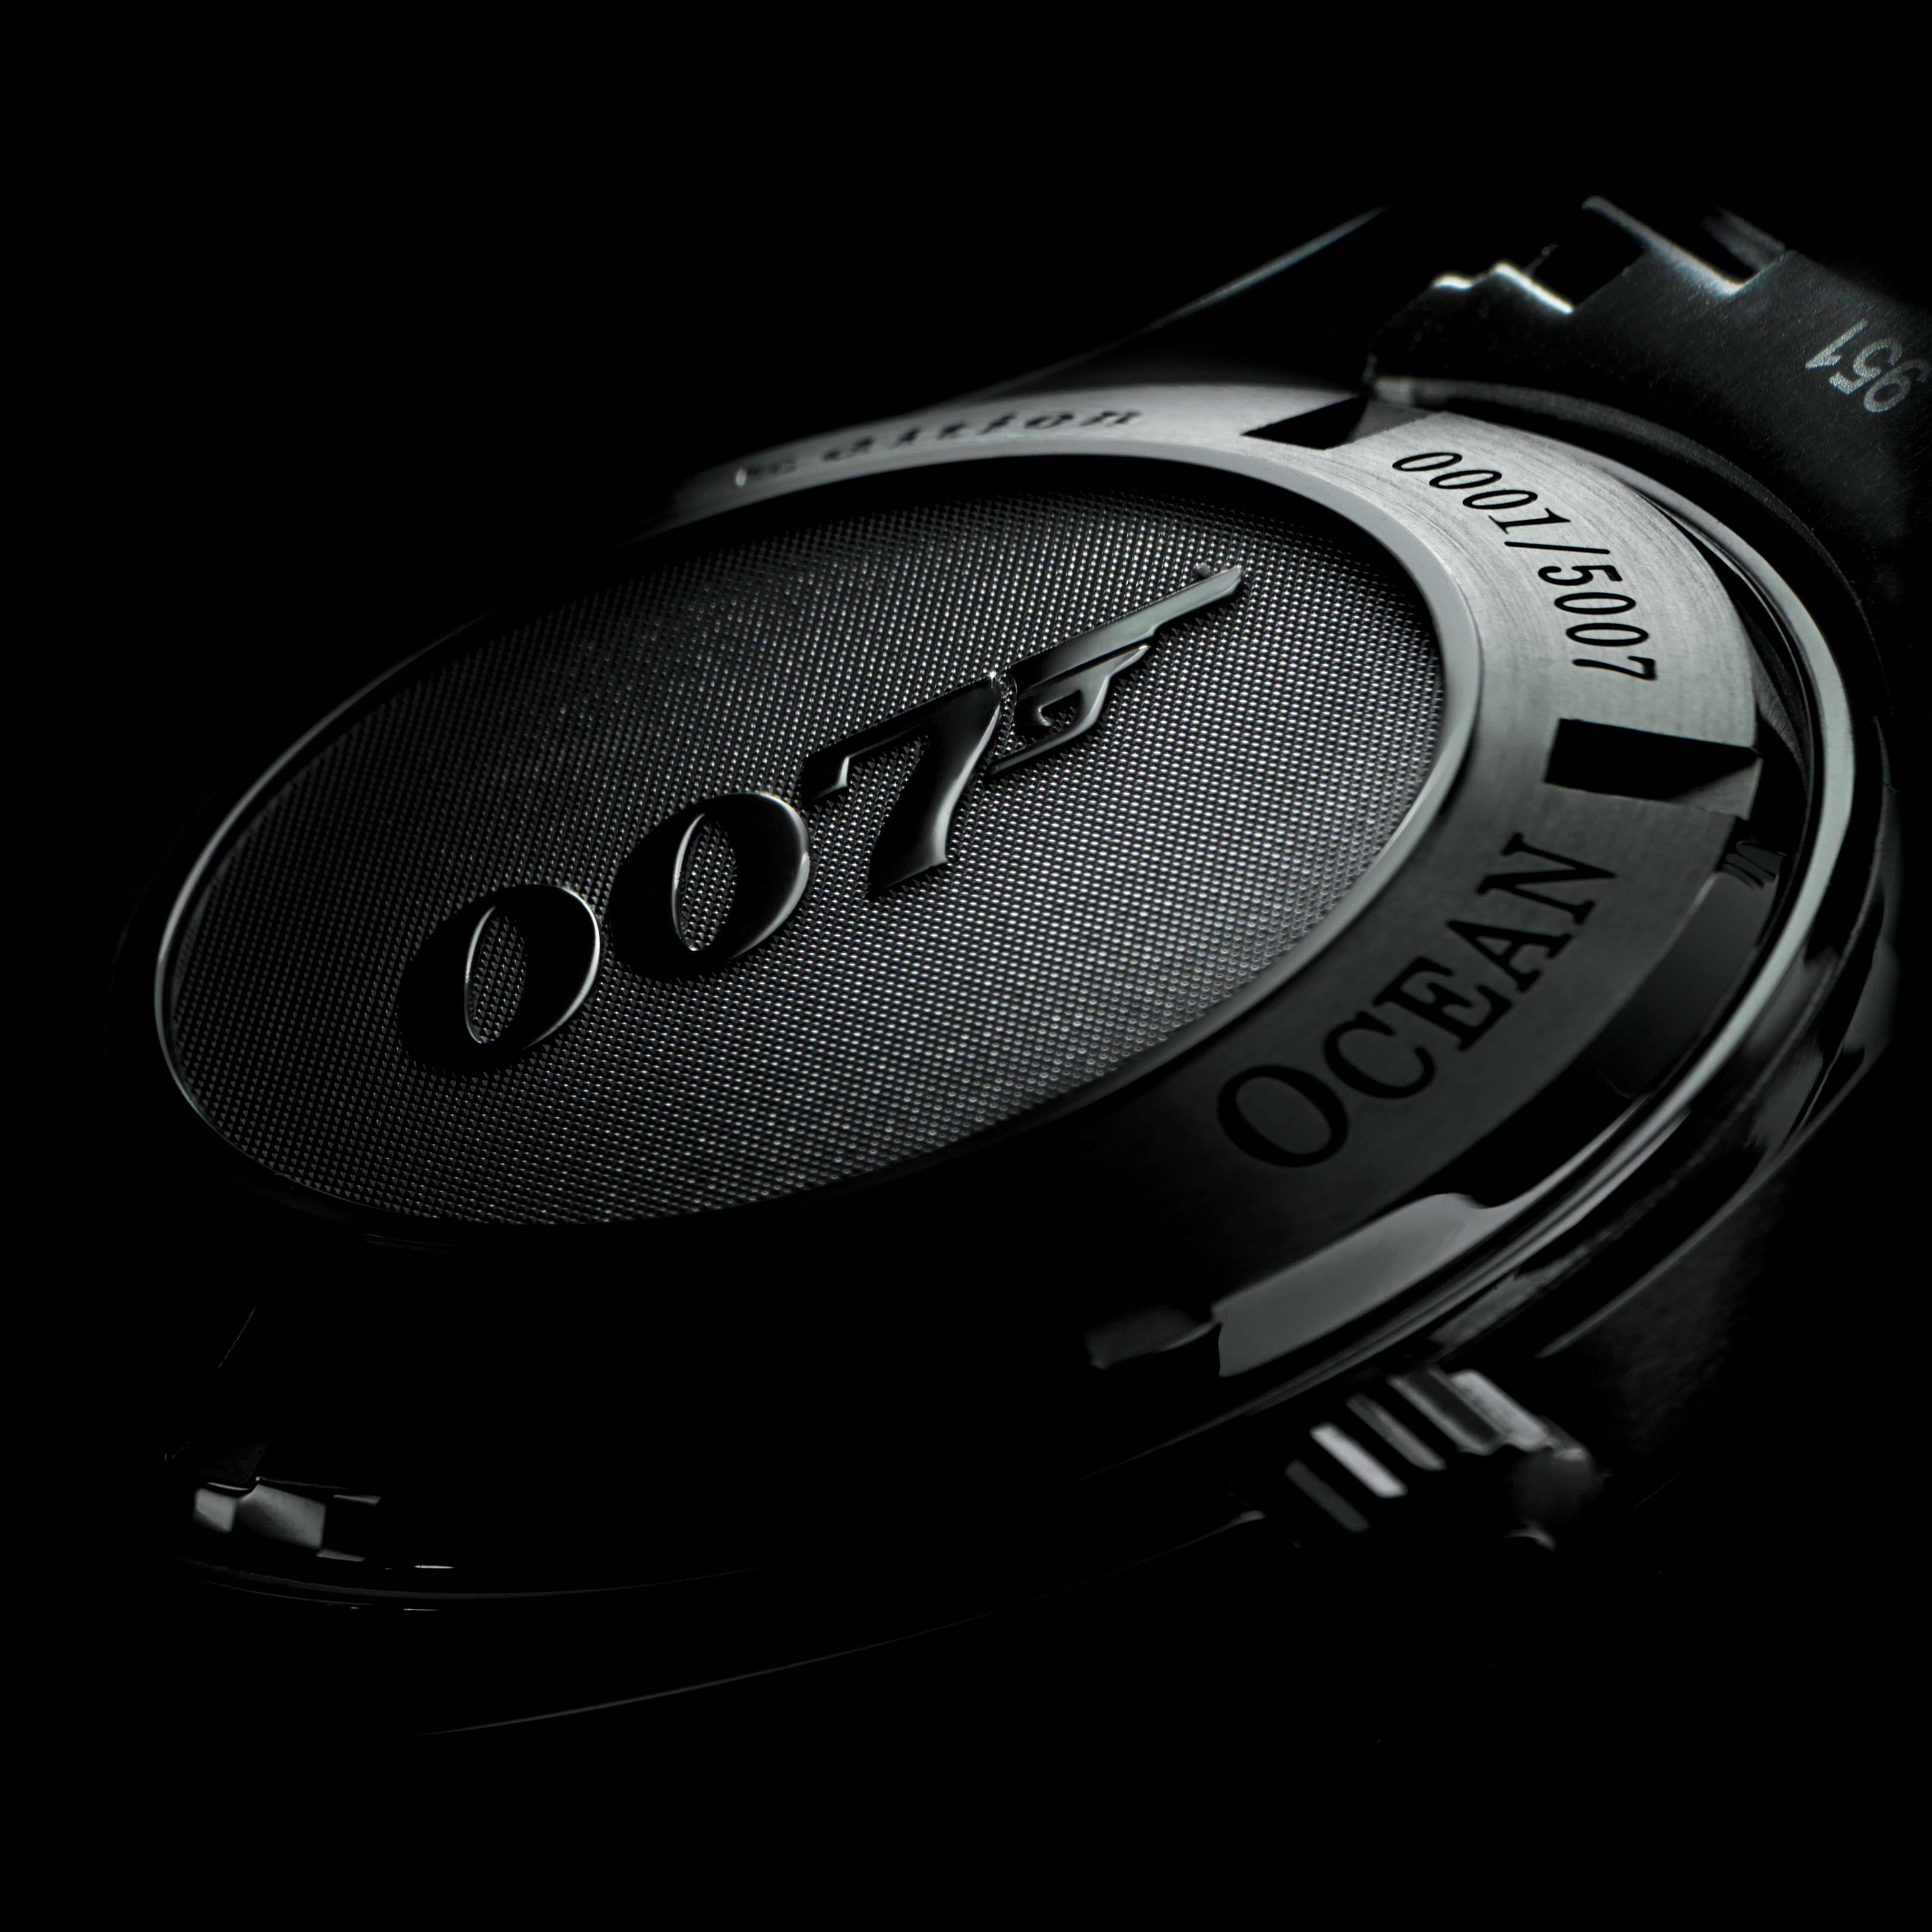 4488x4488 James Bond 007 Wallpapers Group 72 James Bond Style James Bond Its A Mans World